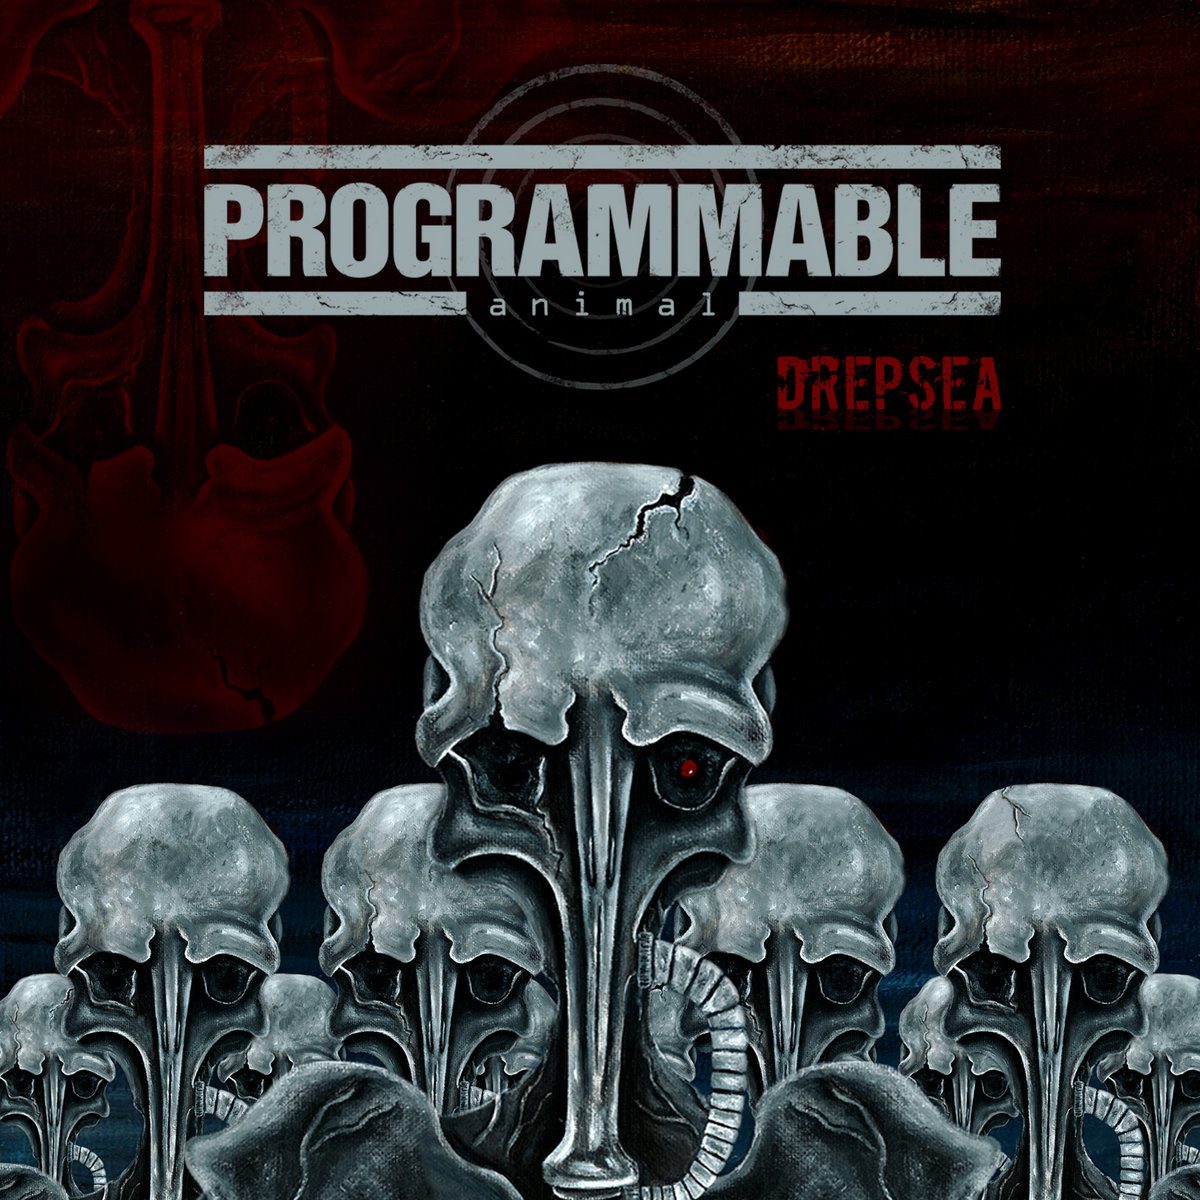 Programmable Animal - Drepsea artwork